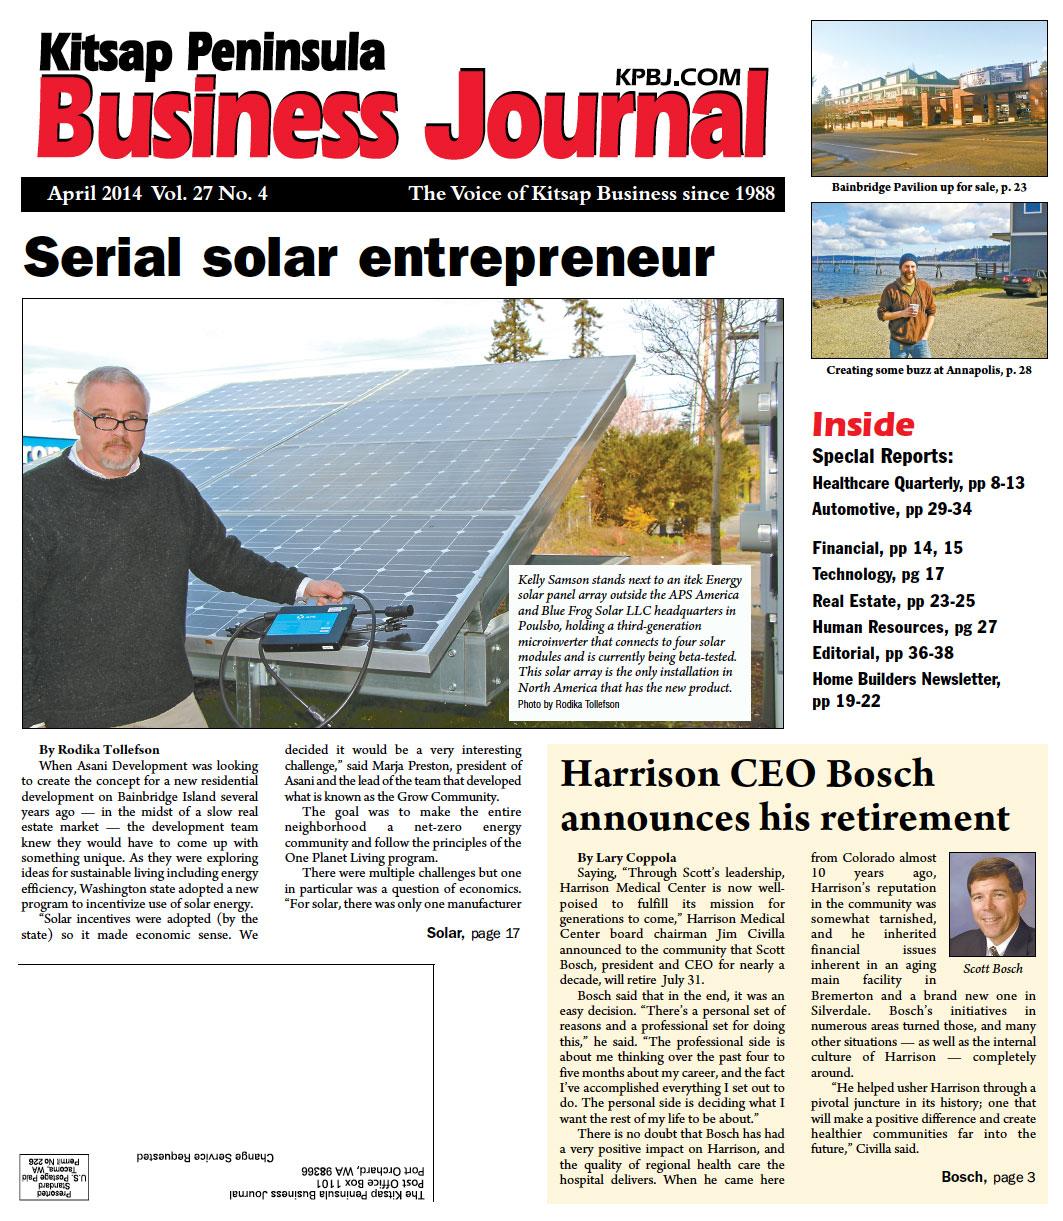 Serial solar entrepeneur